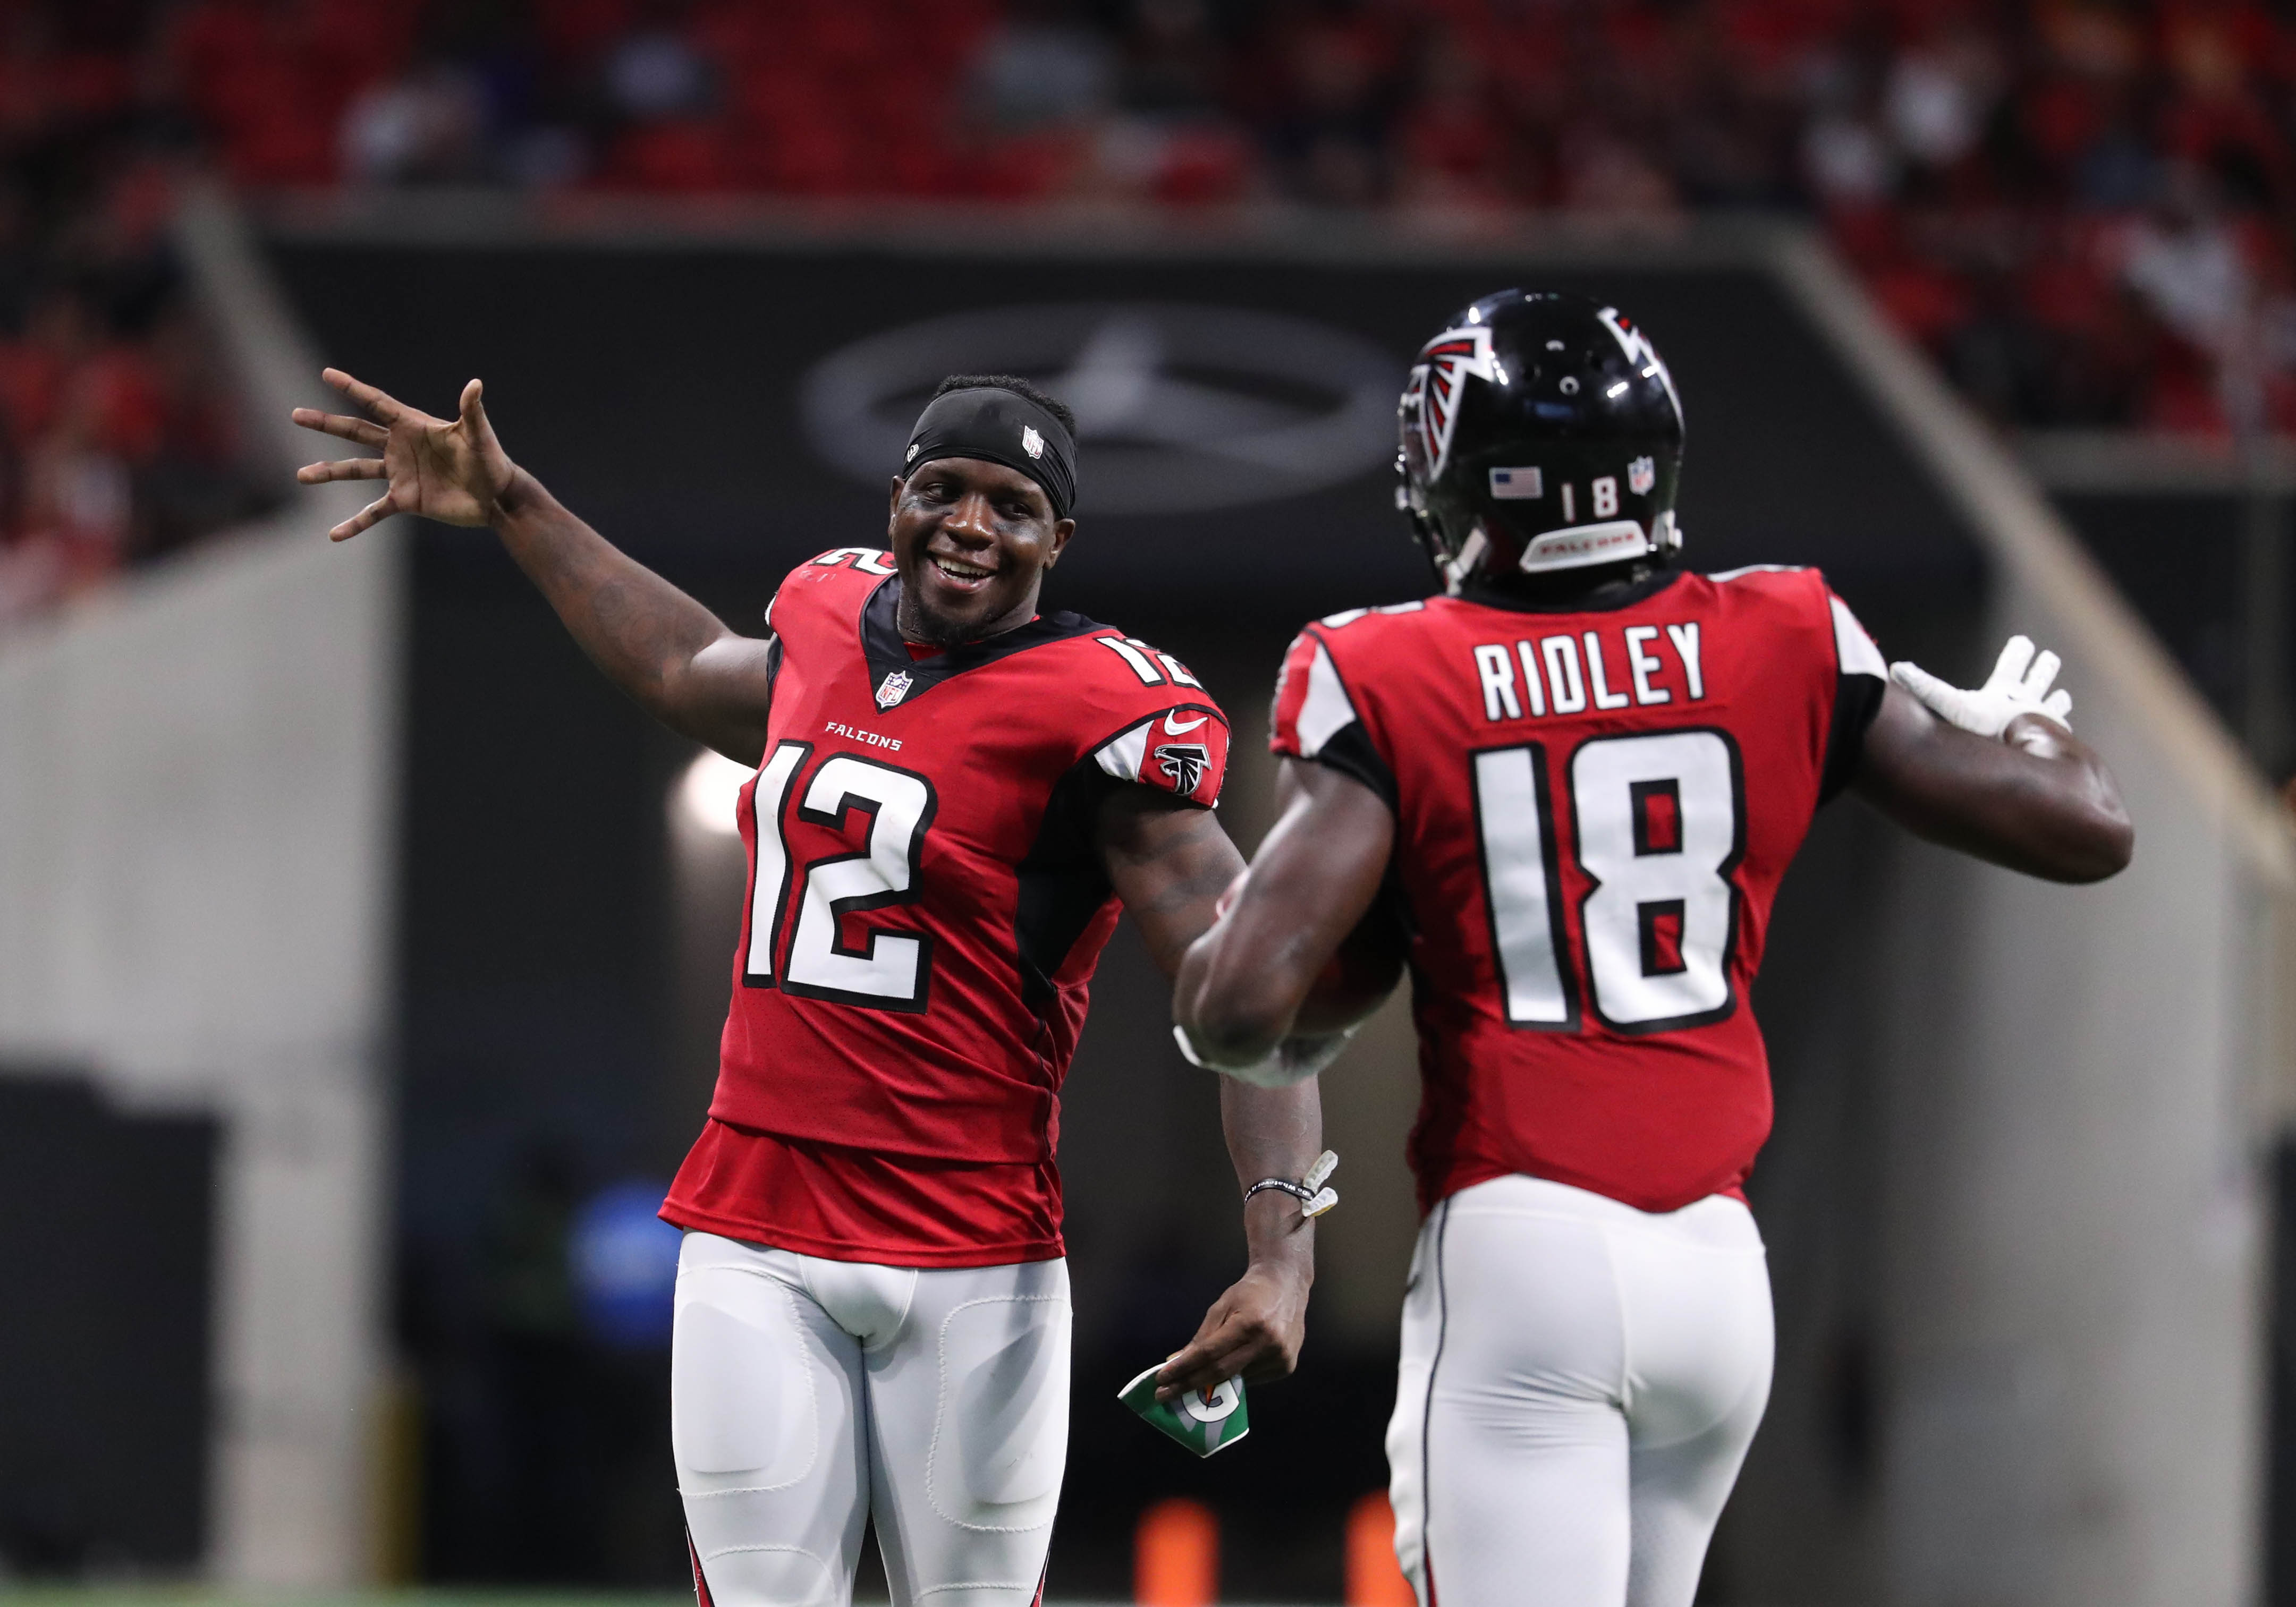 Former Alabama star WR Calvin Ridley scores first NFL TD (Video)